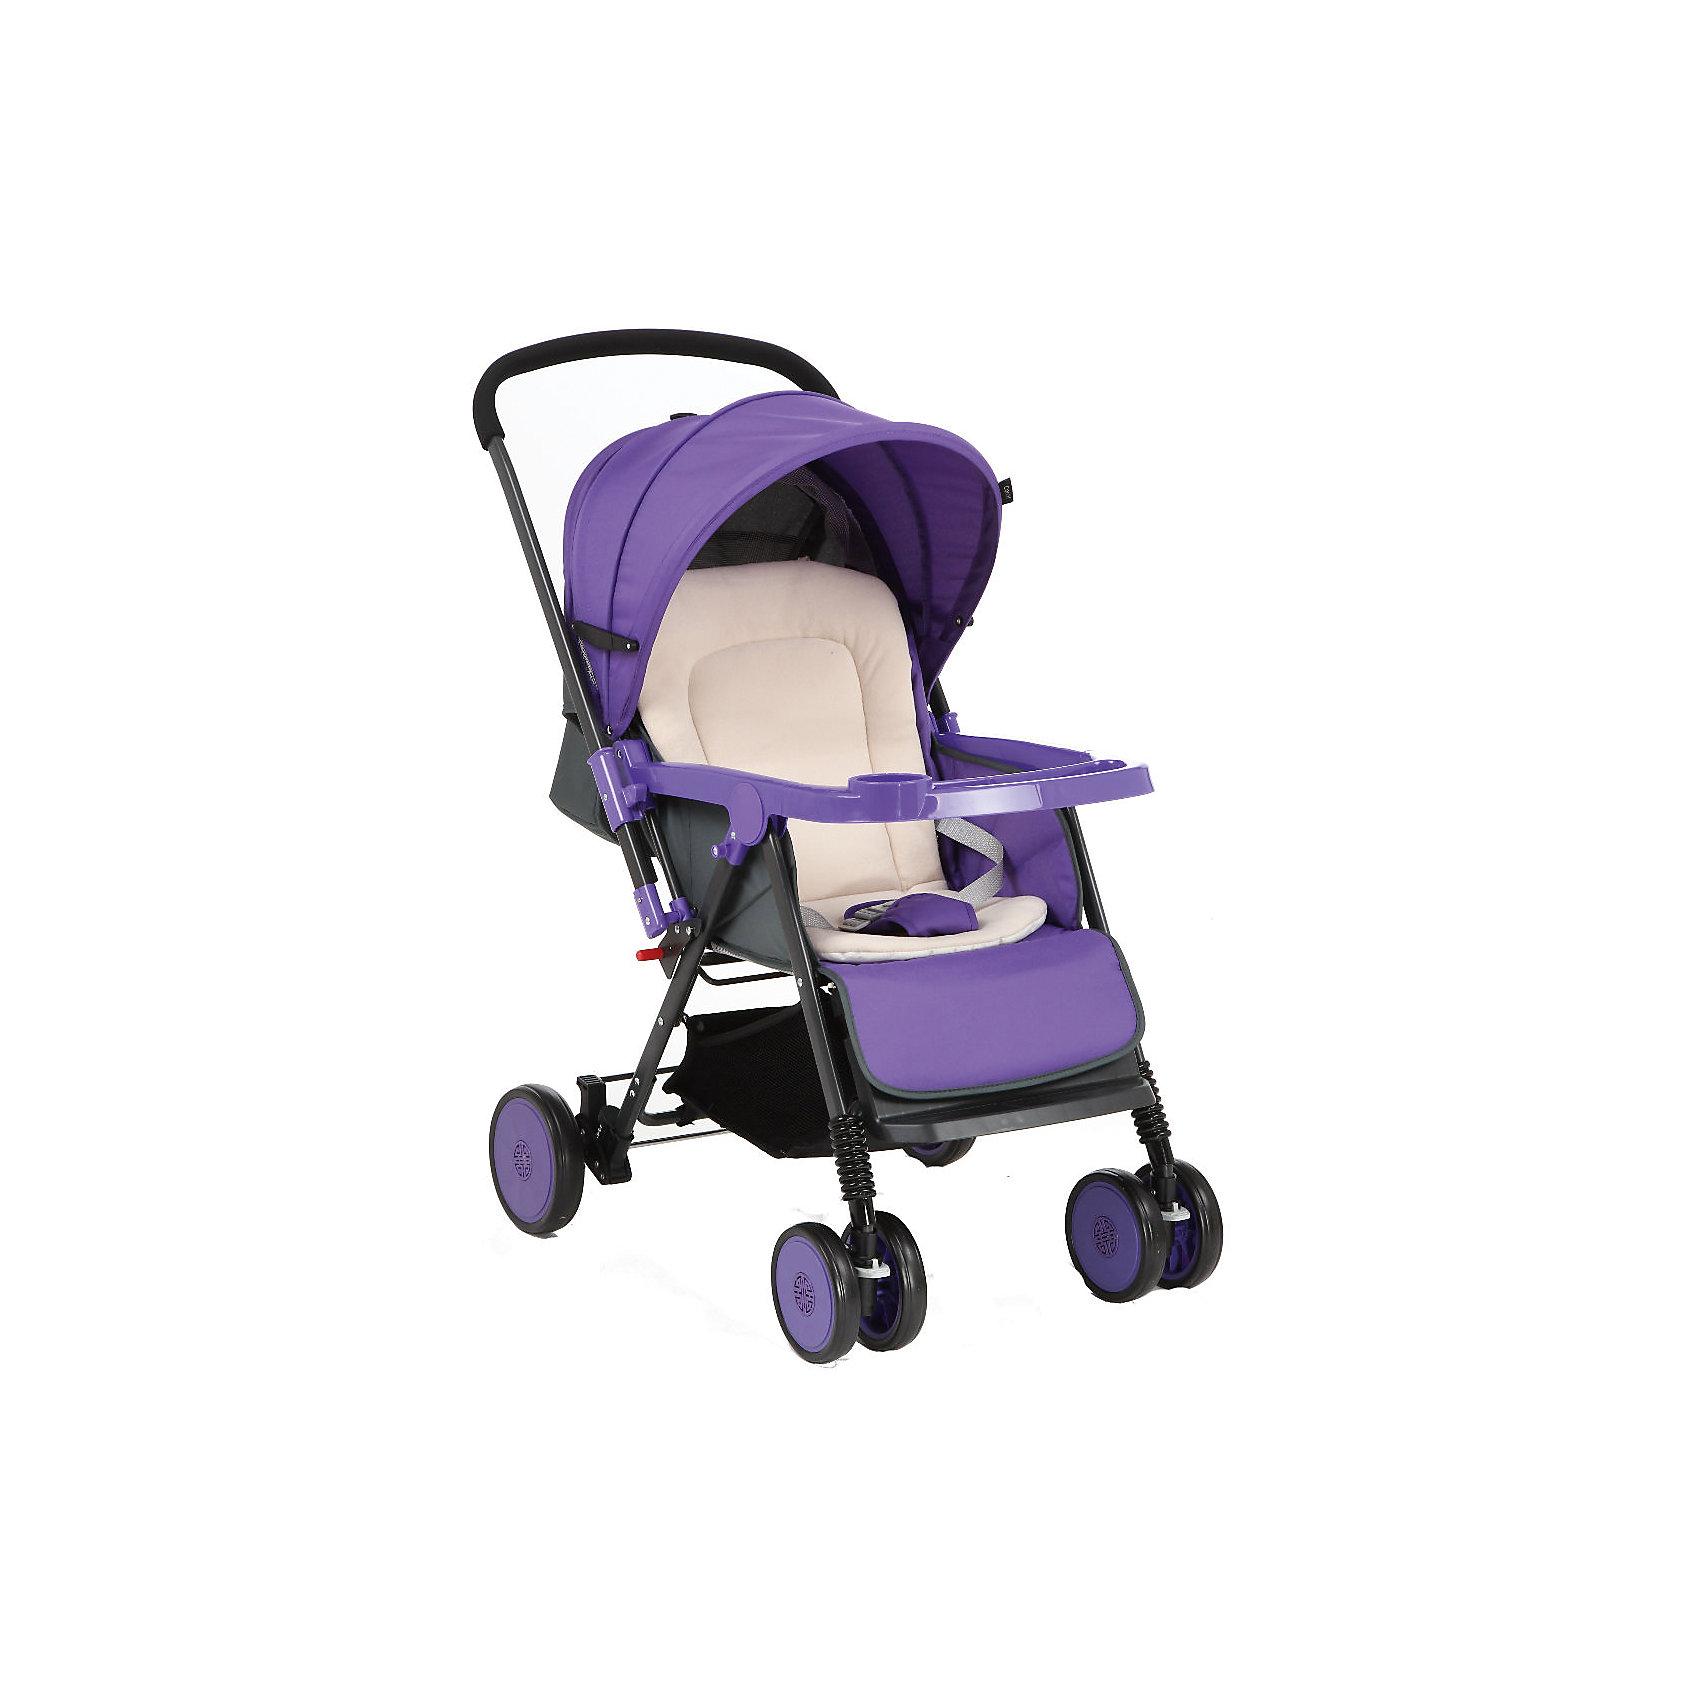 Corol Прогулочная коляска S-7, Corol, фиолетовый corol прогулочная s 3 светло серая